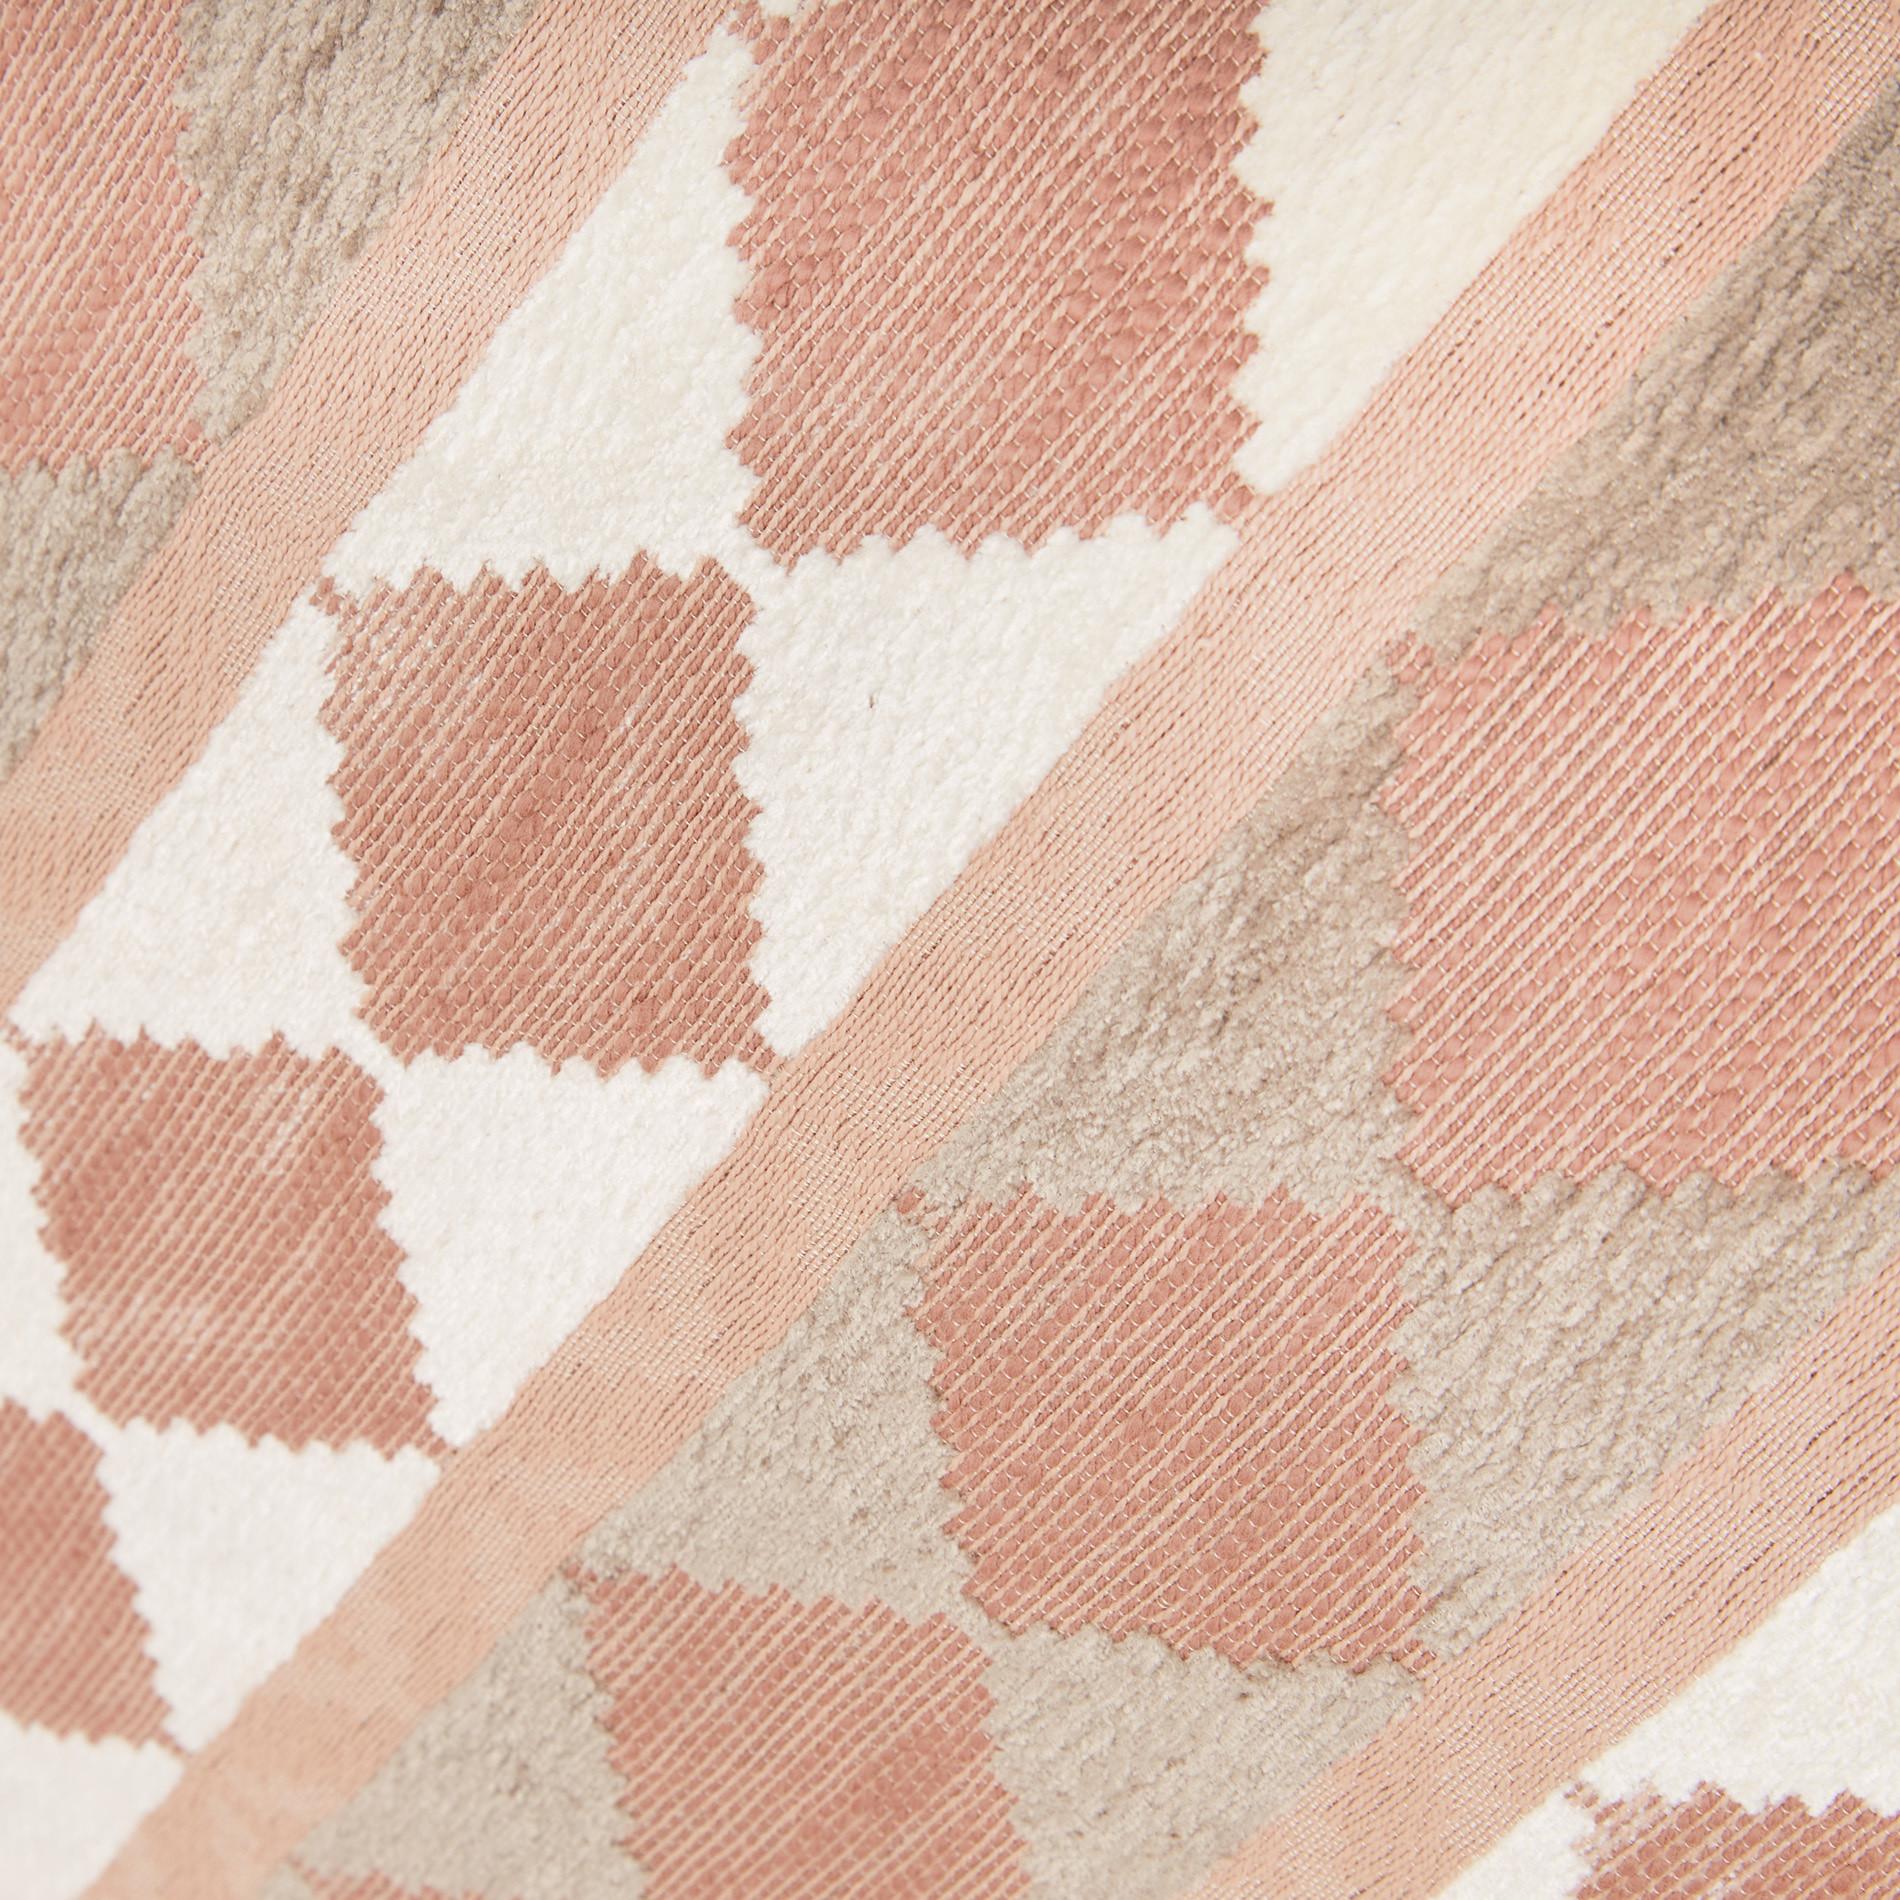 Cuscino jacquard motivo geometrico 50x50cm, Rosa cipria, large image number 2